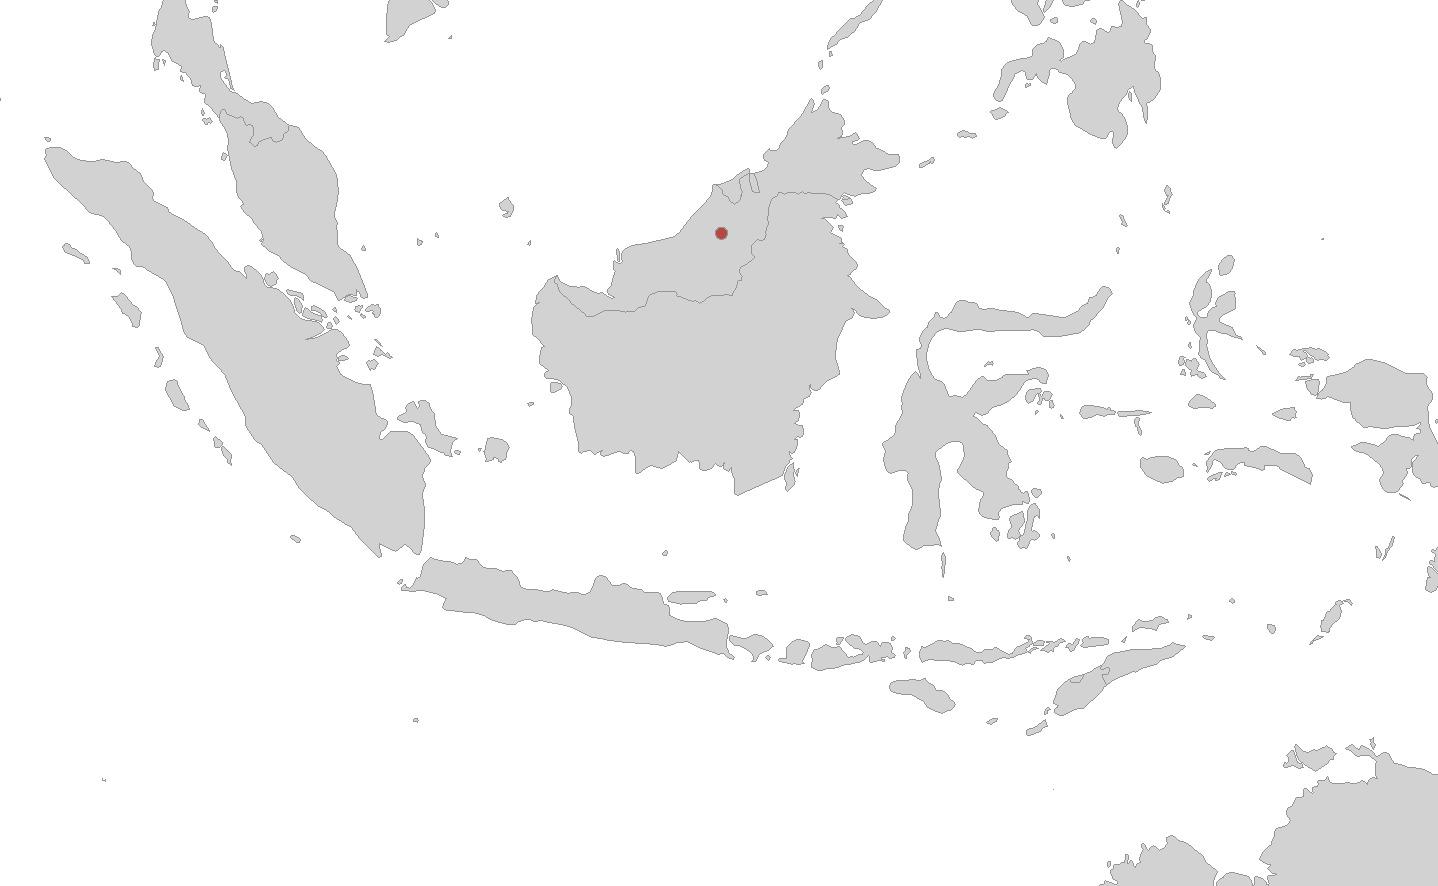 Image of Mount Dulit Caecilian